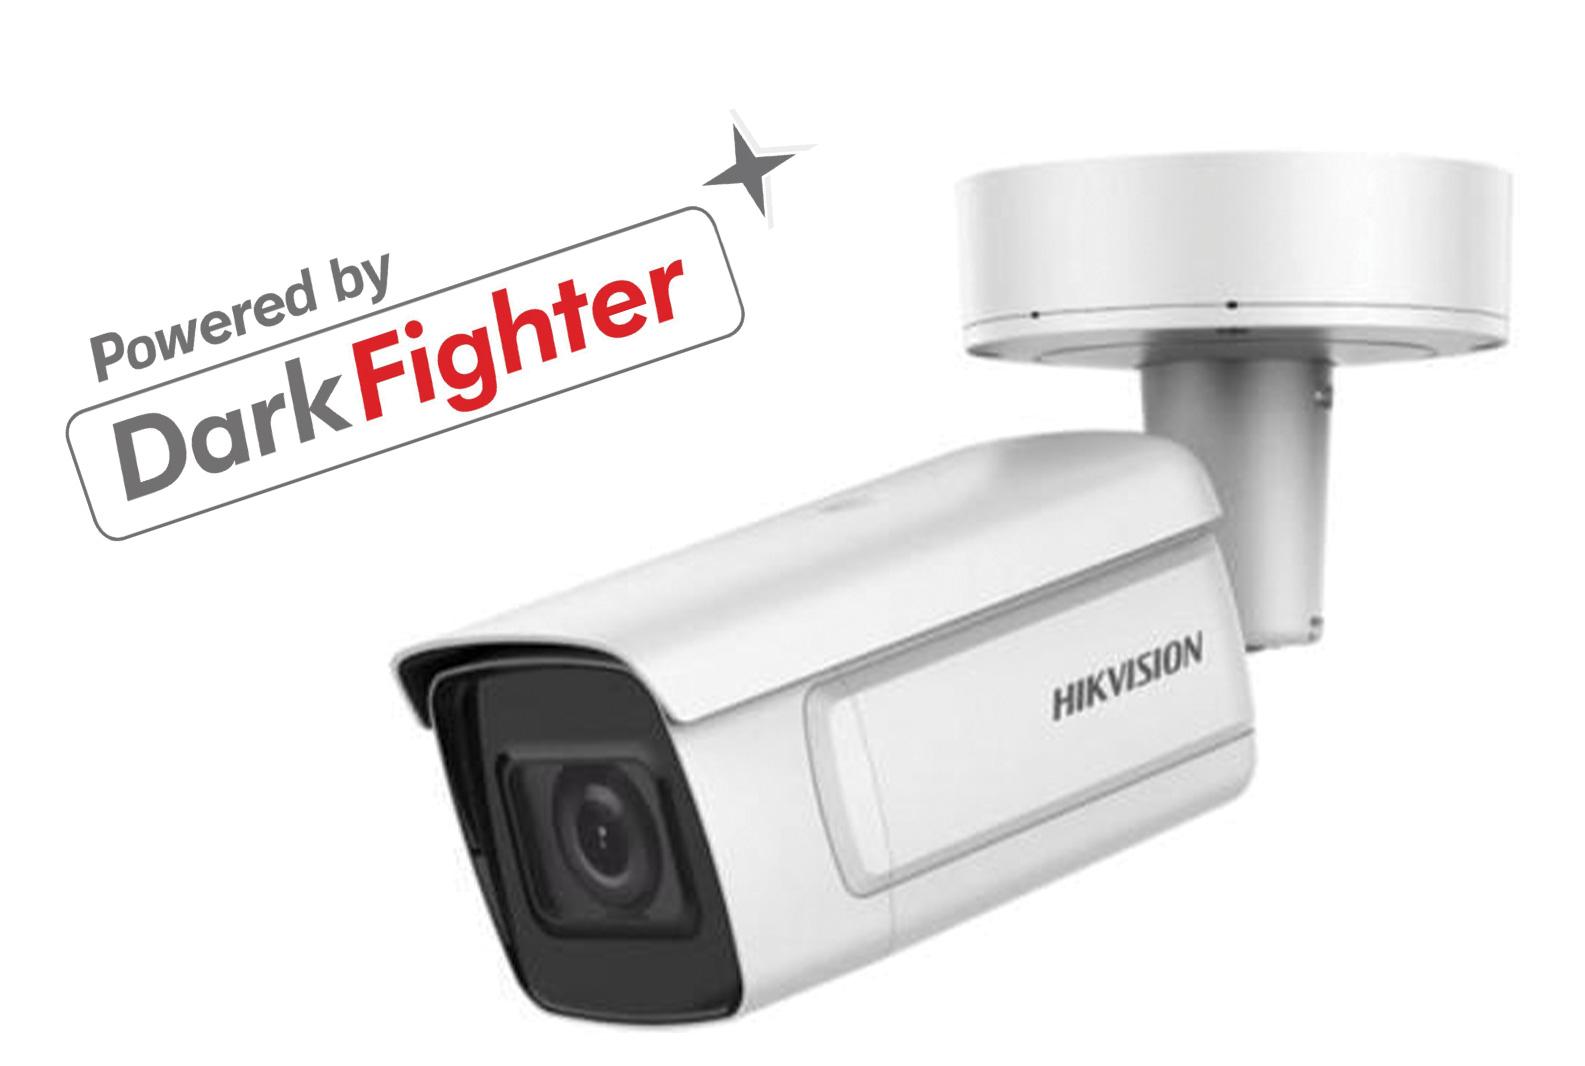 Hikvision-DS-2CD5A26G1-IZS28-12mm-IP-Bullet-Ueberwachung-Kamera.jpg